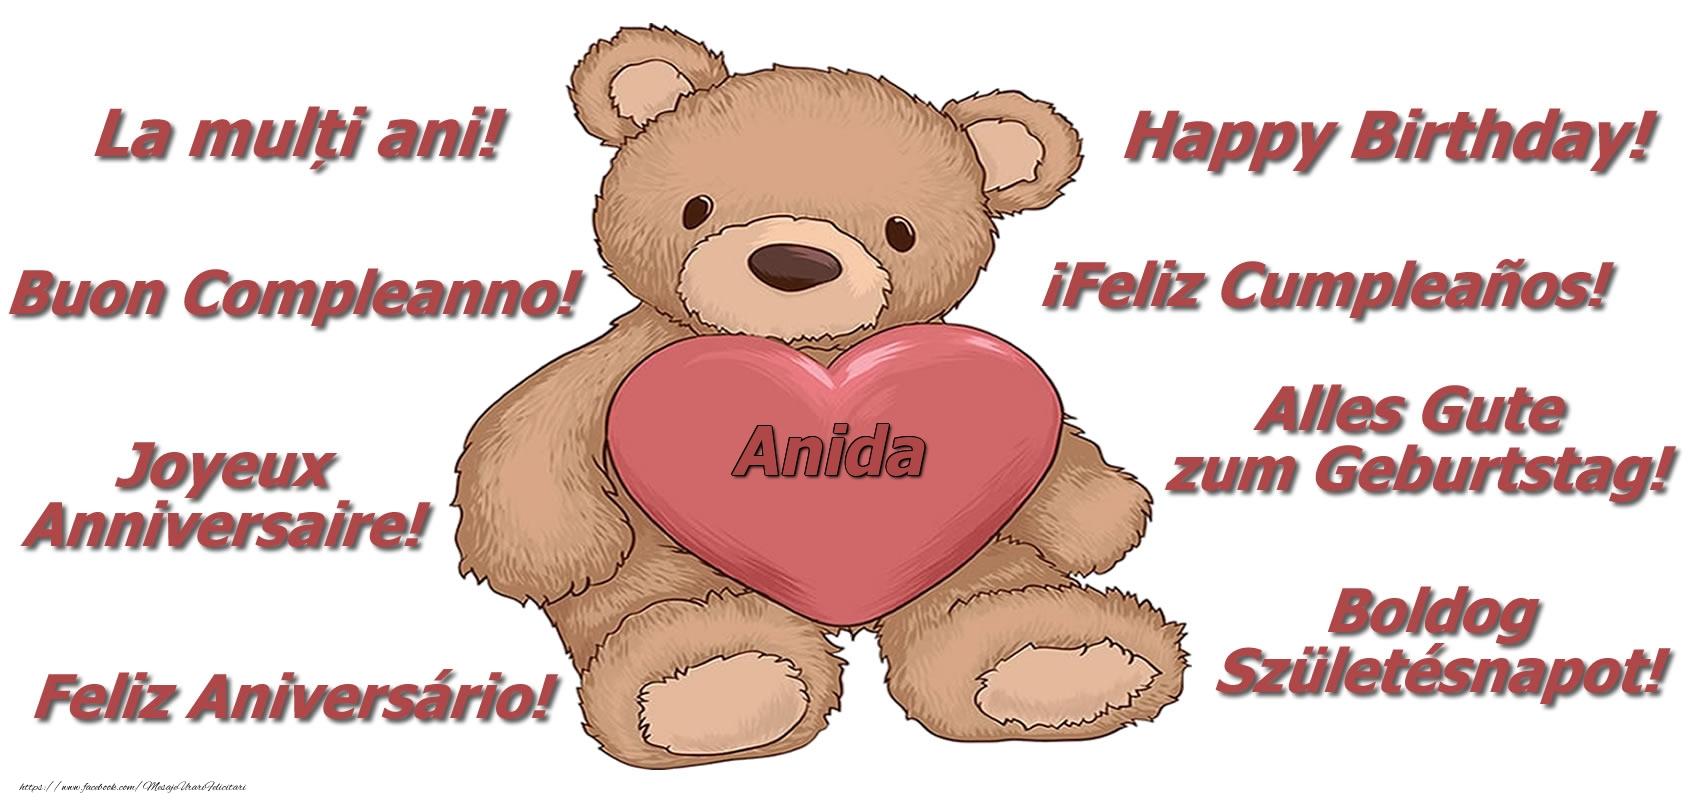 Felicitari de zi de nastere - La multi ani Anida! - Ursulet